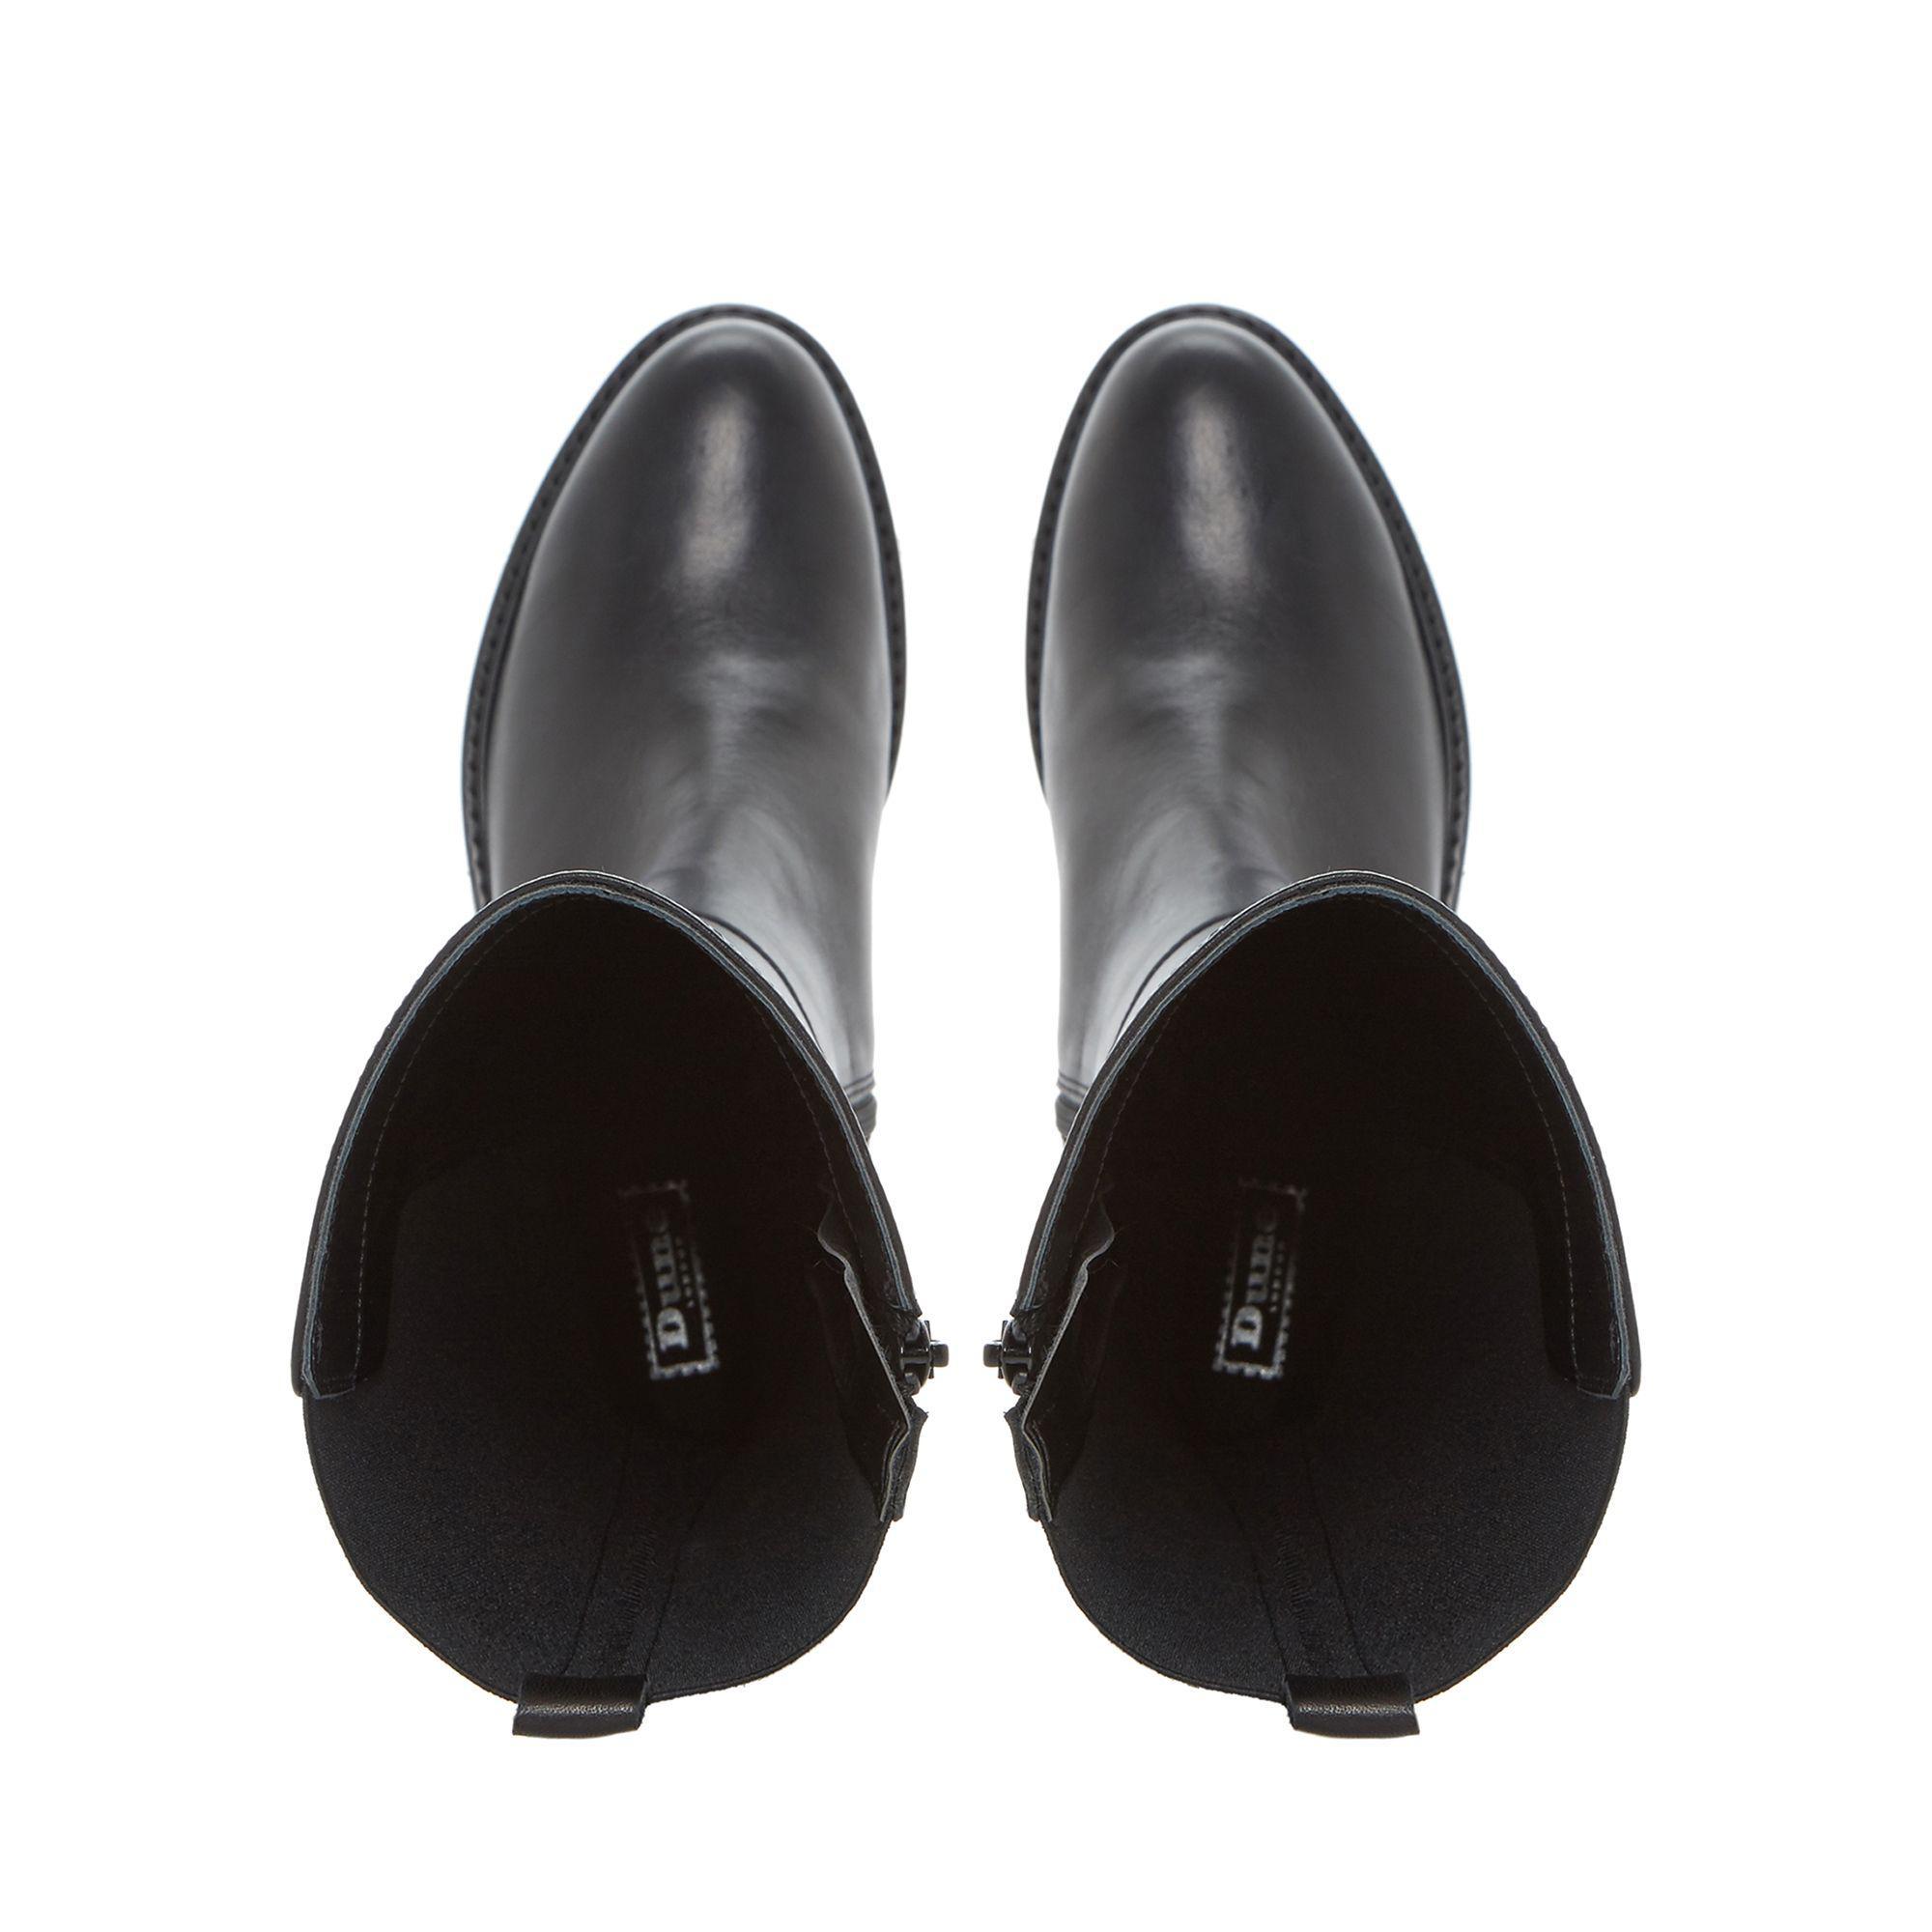 Dune Black 'tula' Elasticated Insert Flatform Knee High Boot